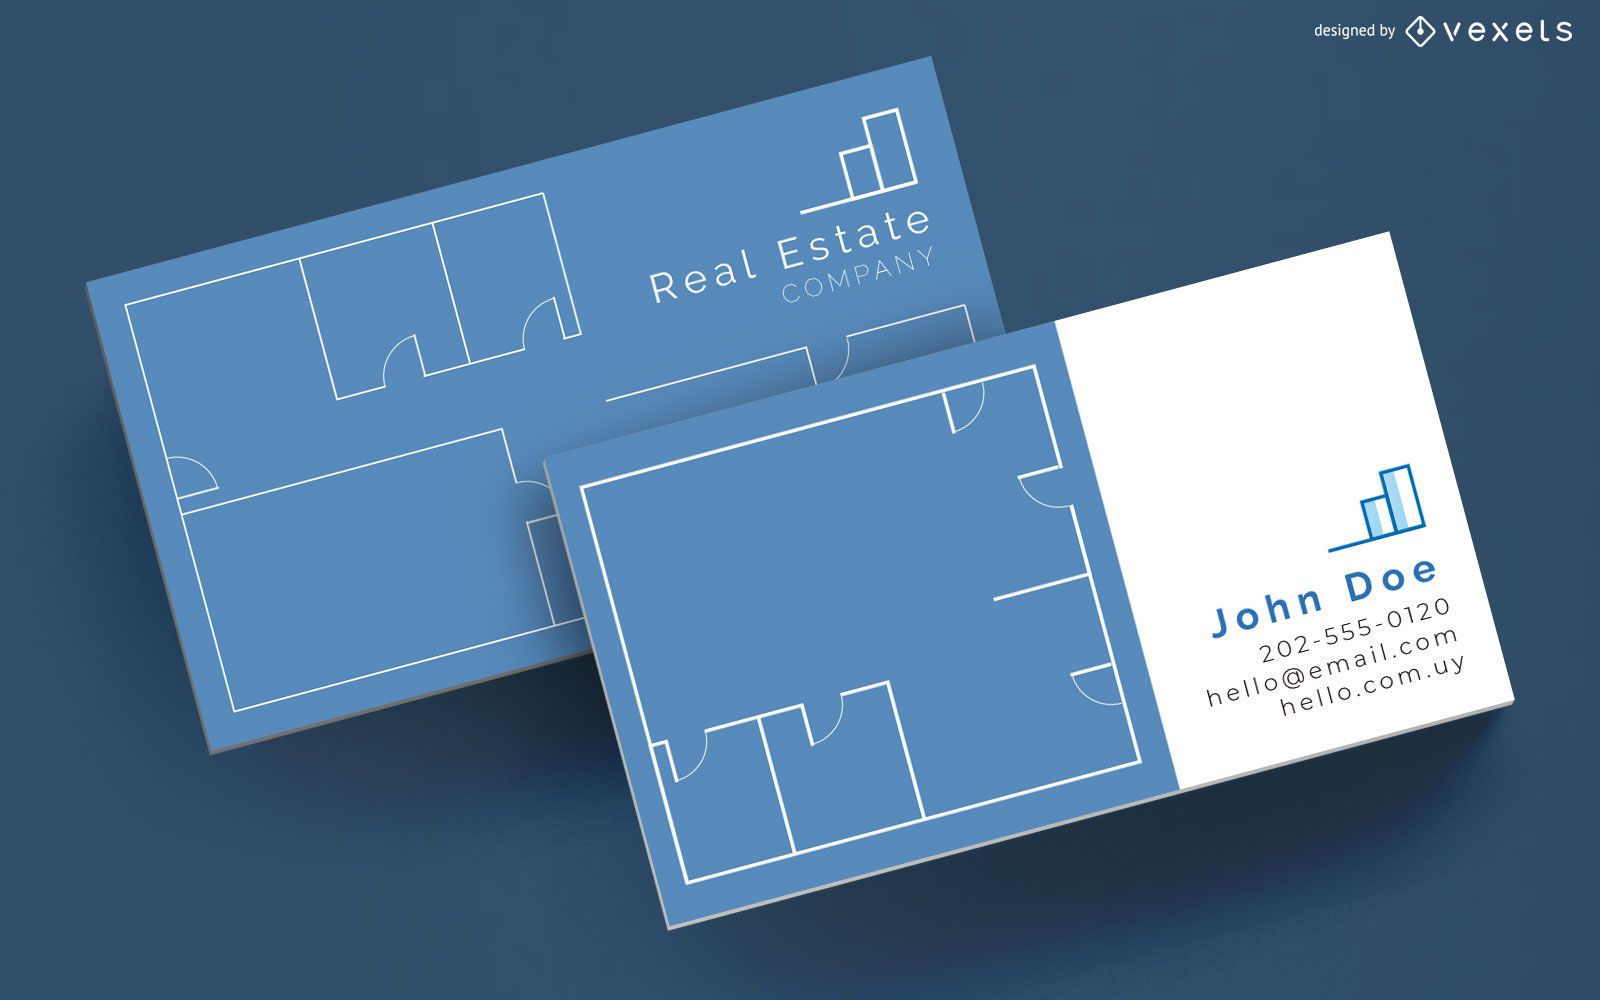 Real Estate Corporate Business Card Design